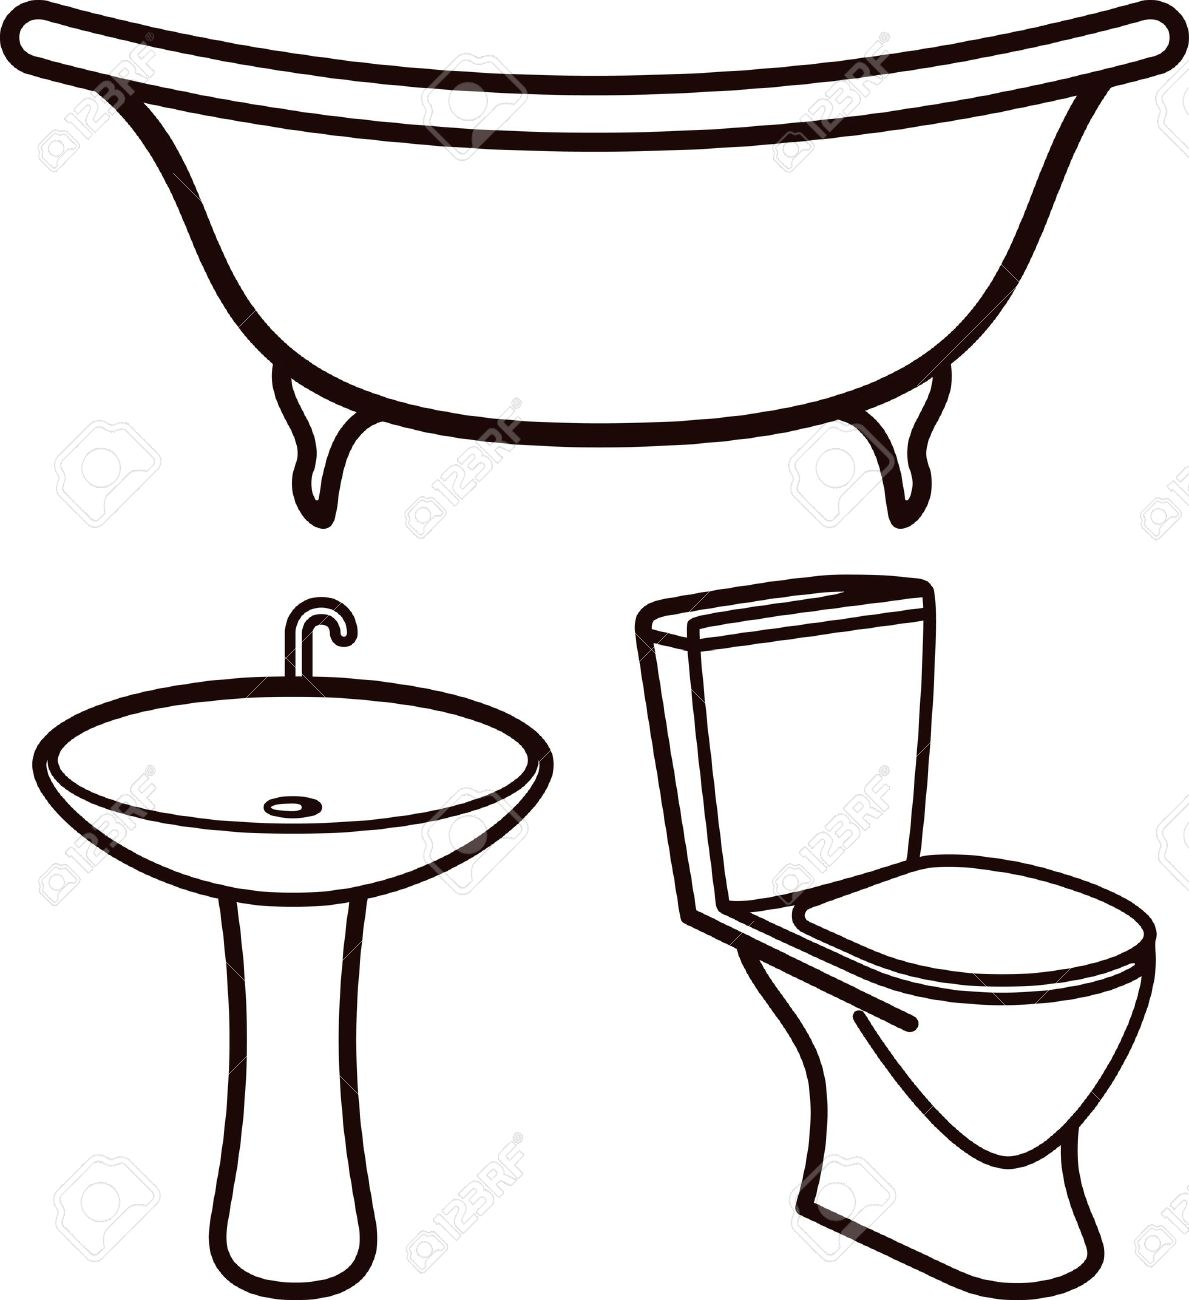 Royalty Free Public Restroom Mirror Clip Art Vector: Free Download Best Bathroom Clipart On